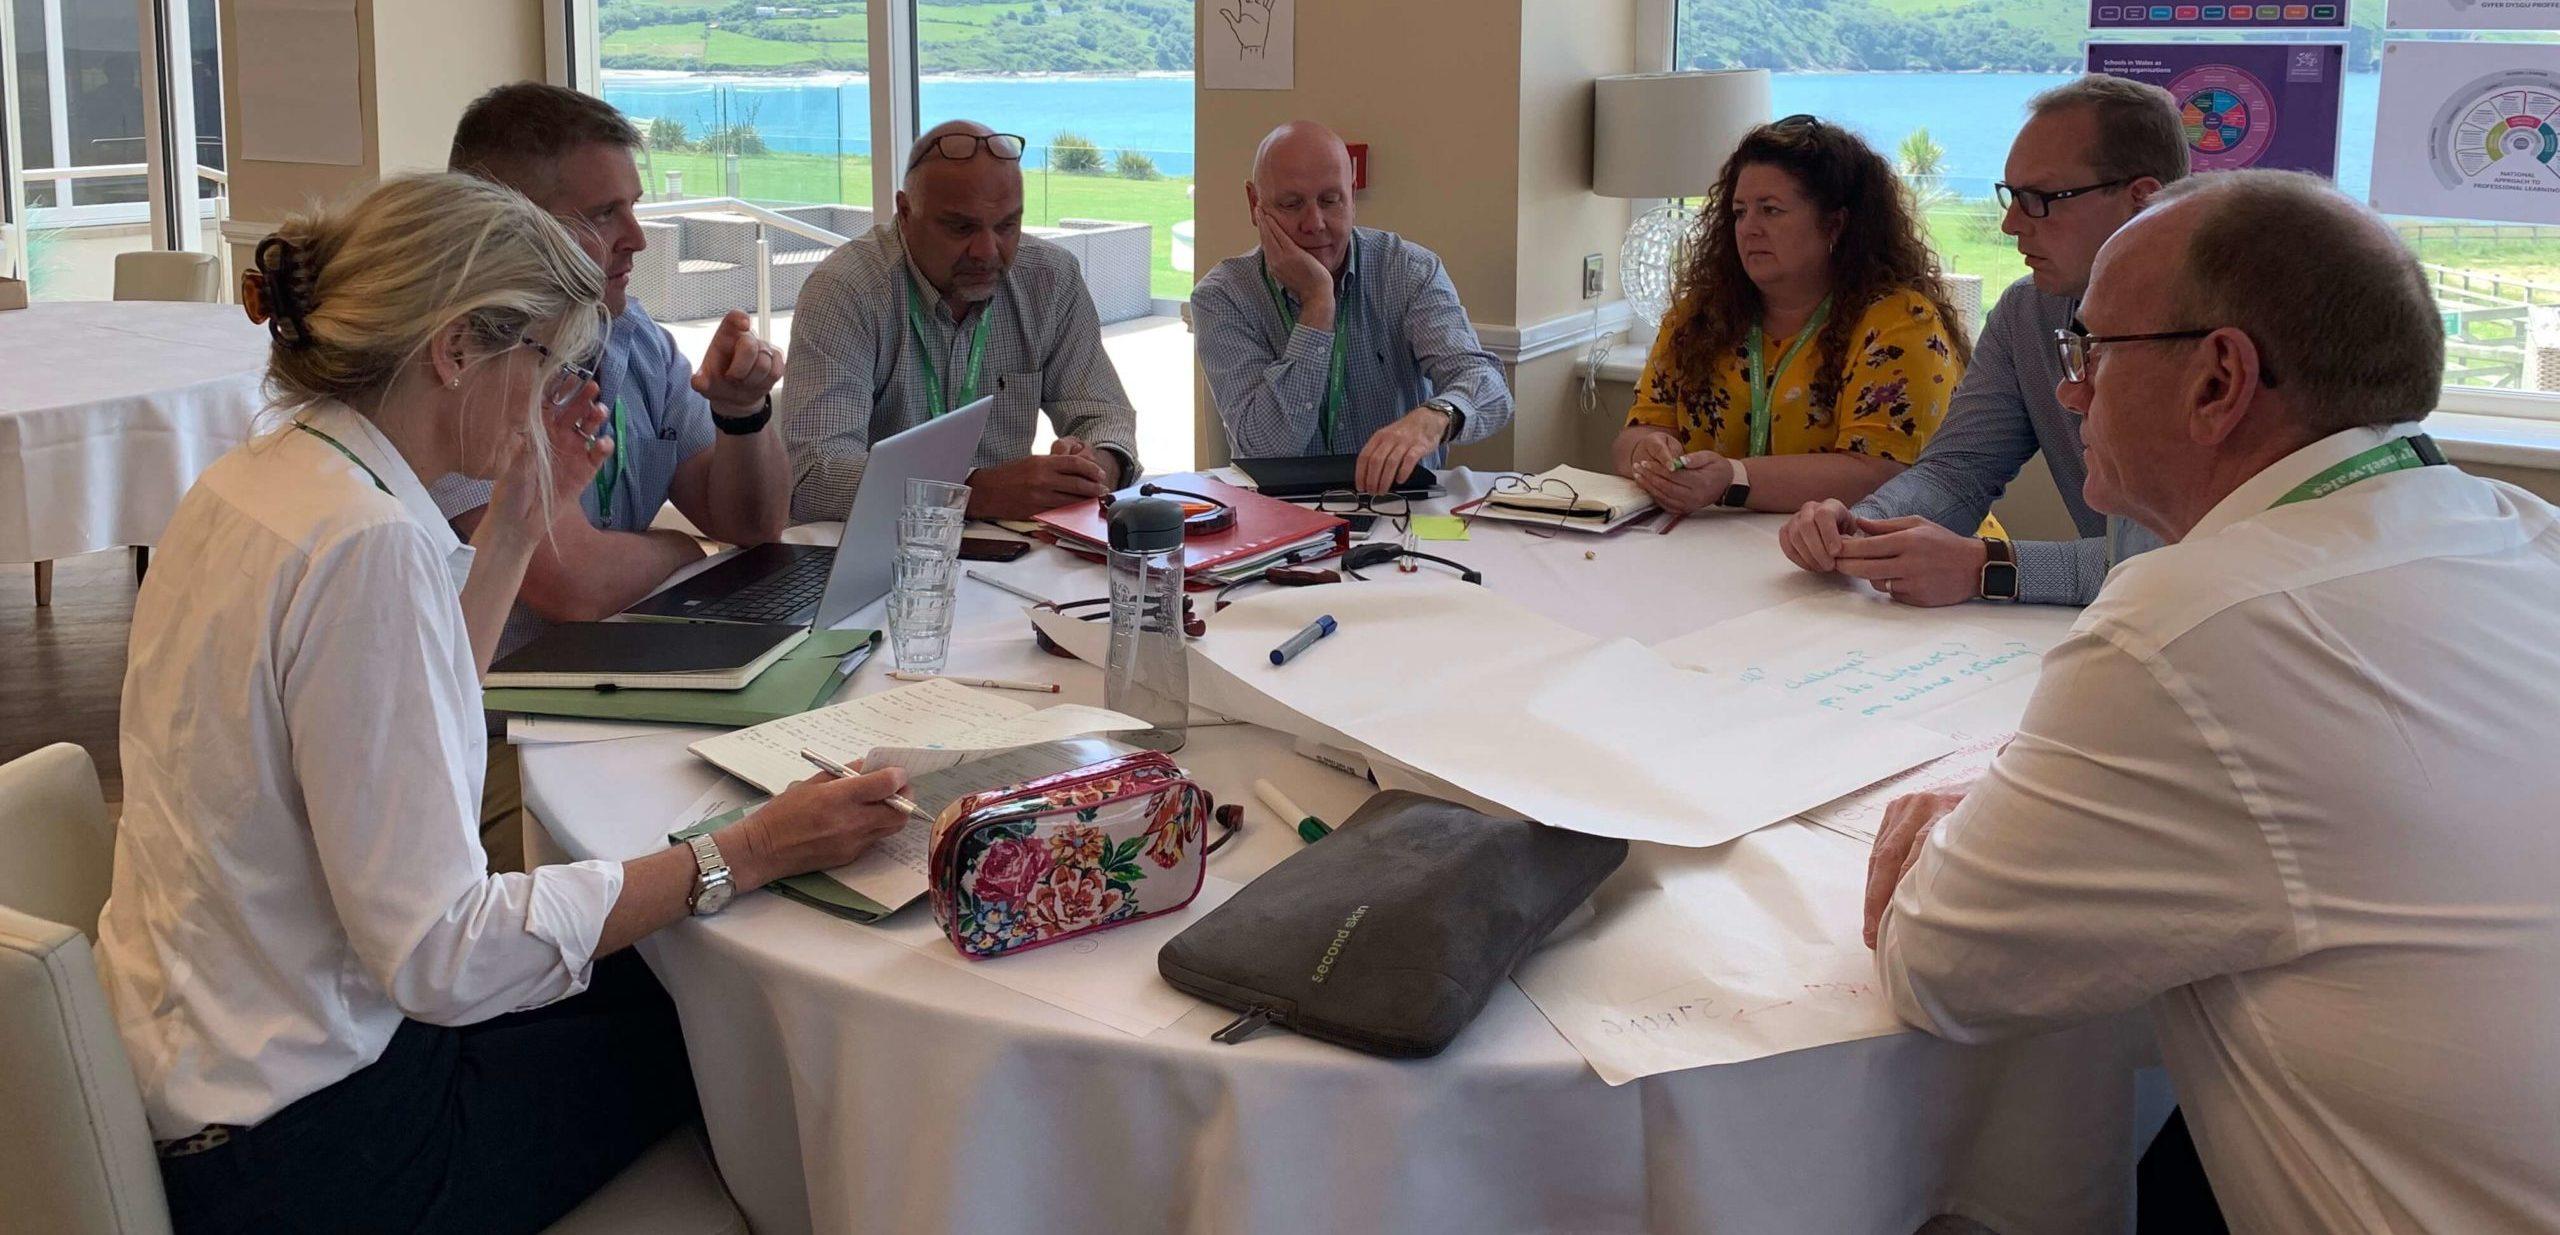 Teamwork - Quality Assurance Team Photo